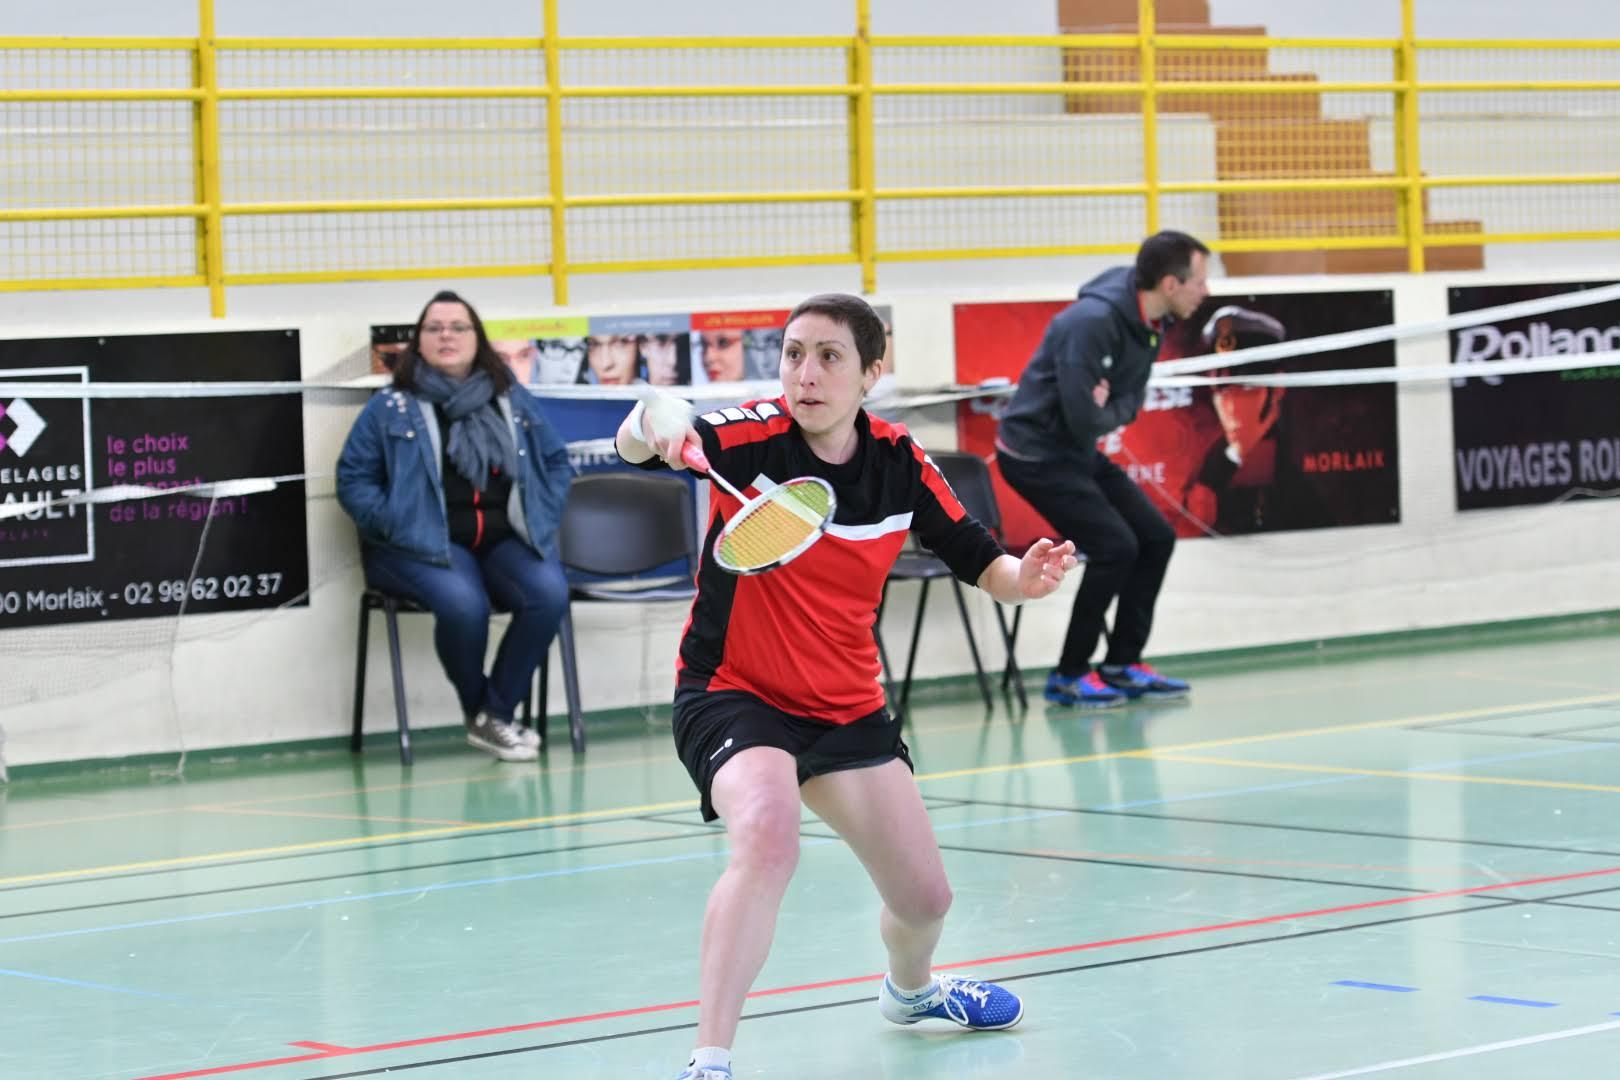 photos/2018-2019/tournois_adultes/finistere_morlaix_2019/29_-_sandra.jpg